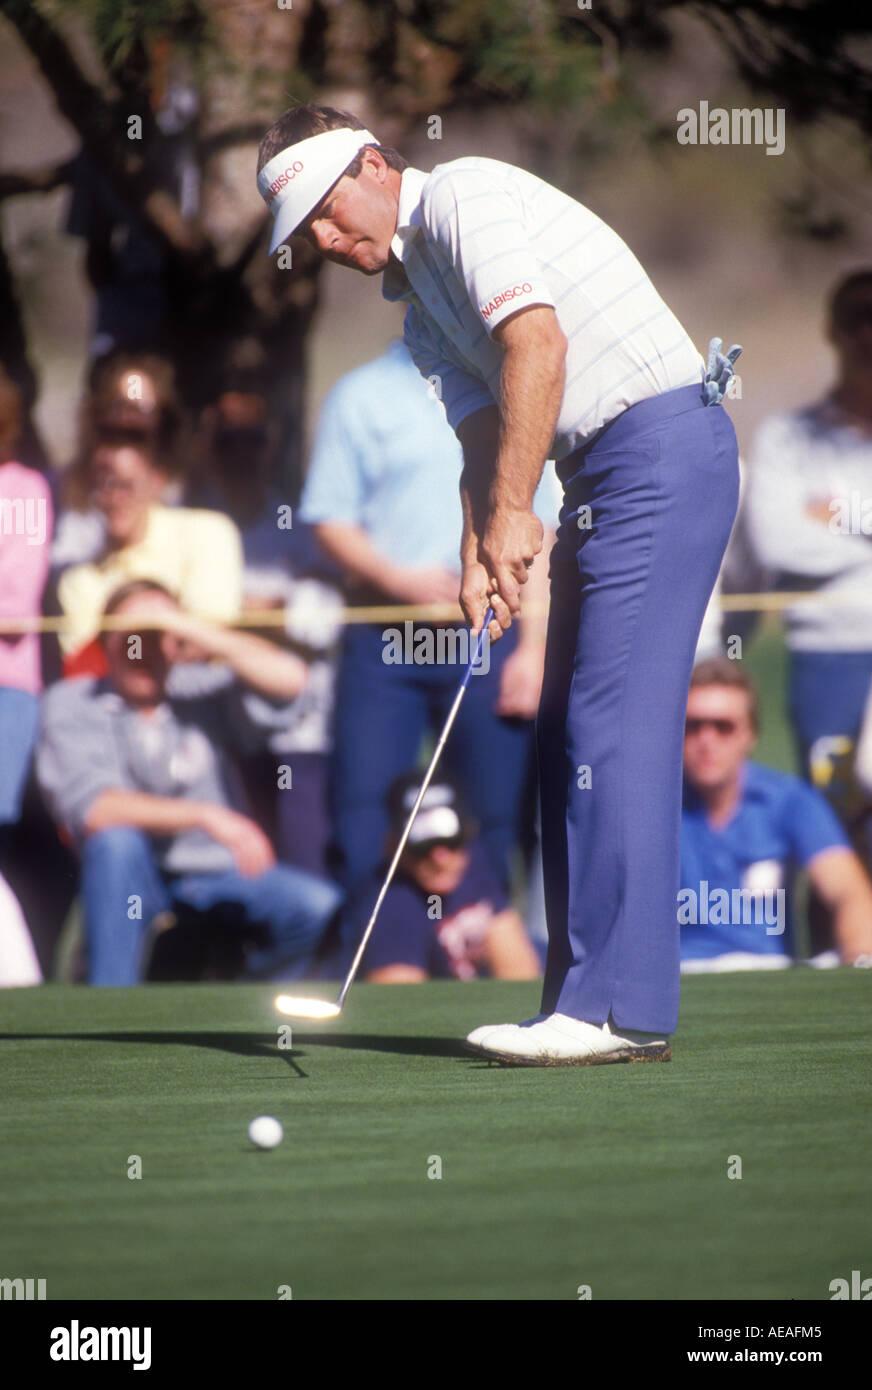 Ben Crenshaw competes in California golf tournament. - Stock Image